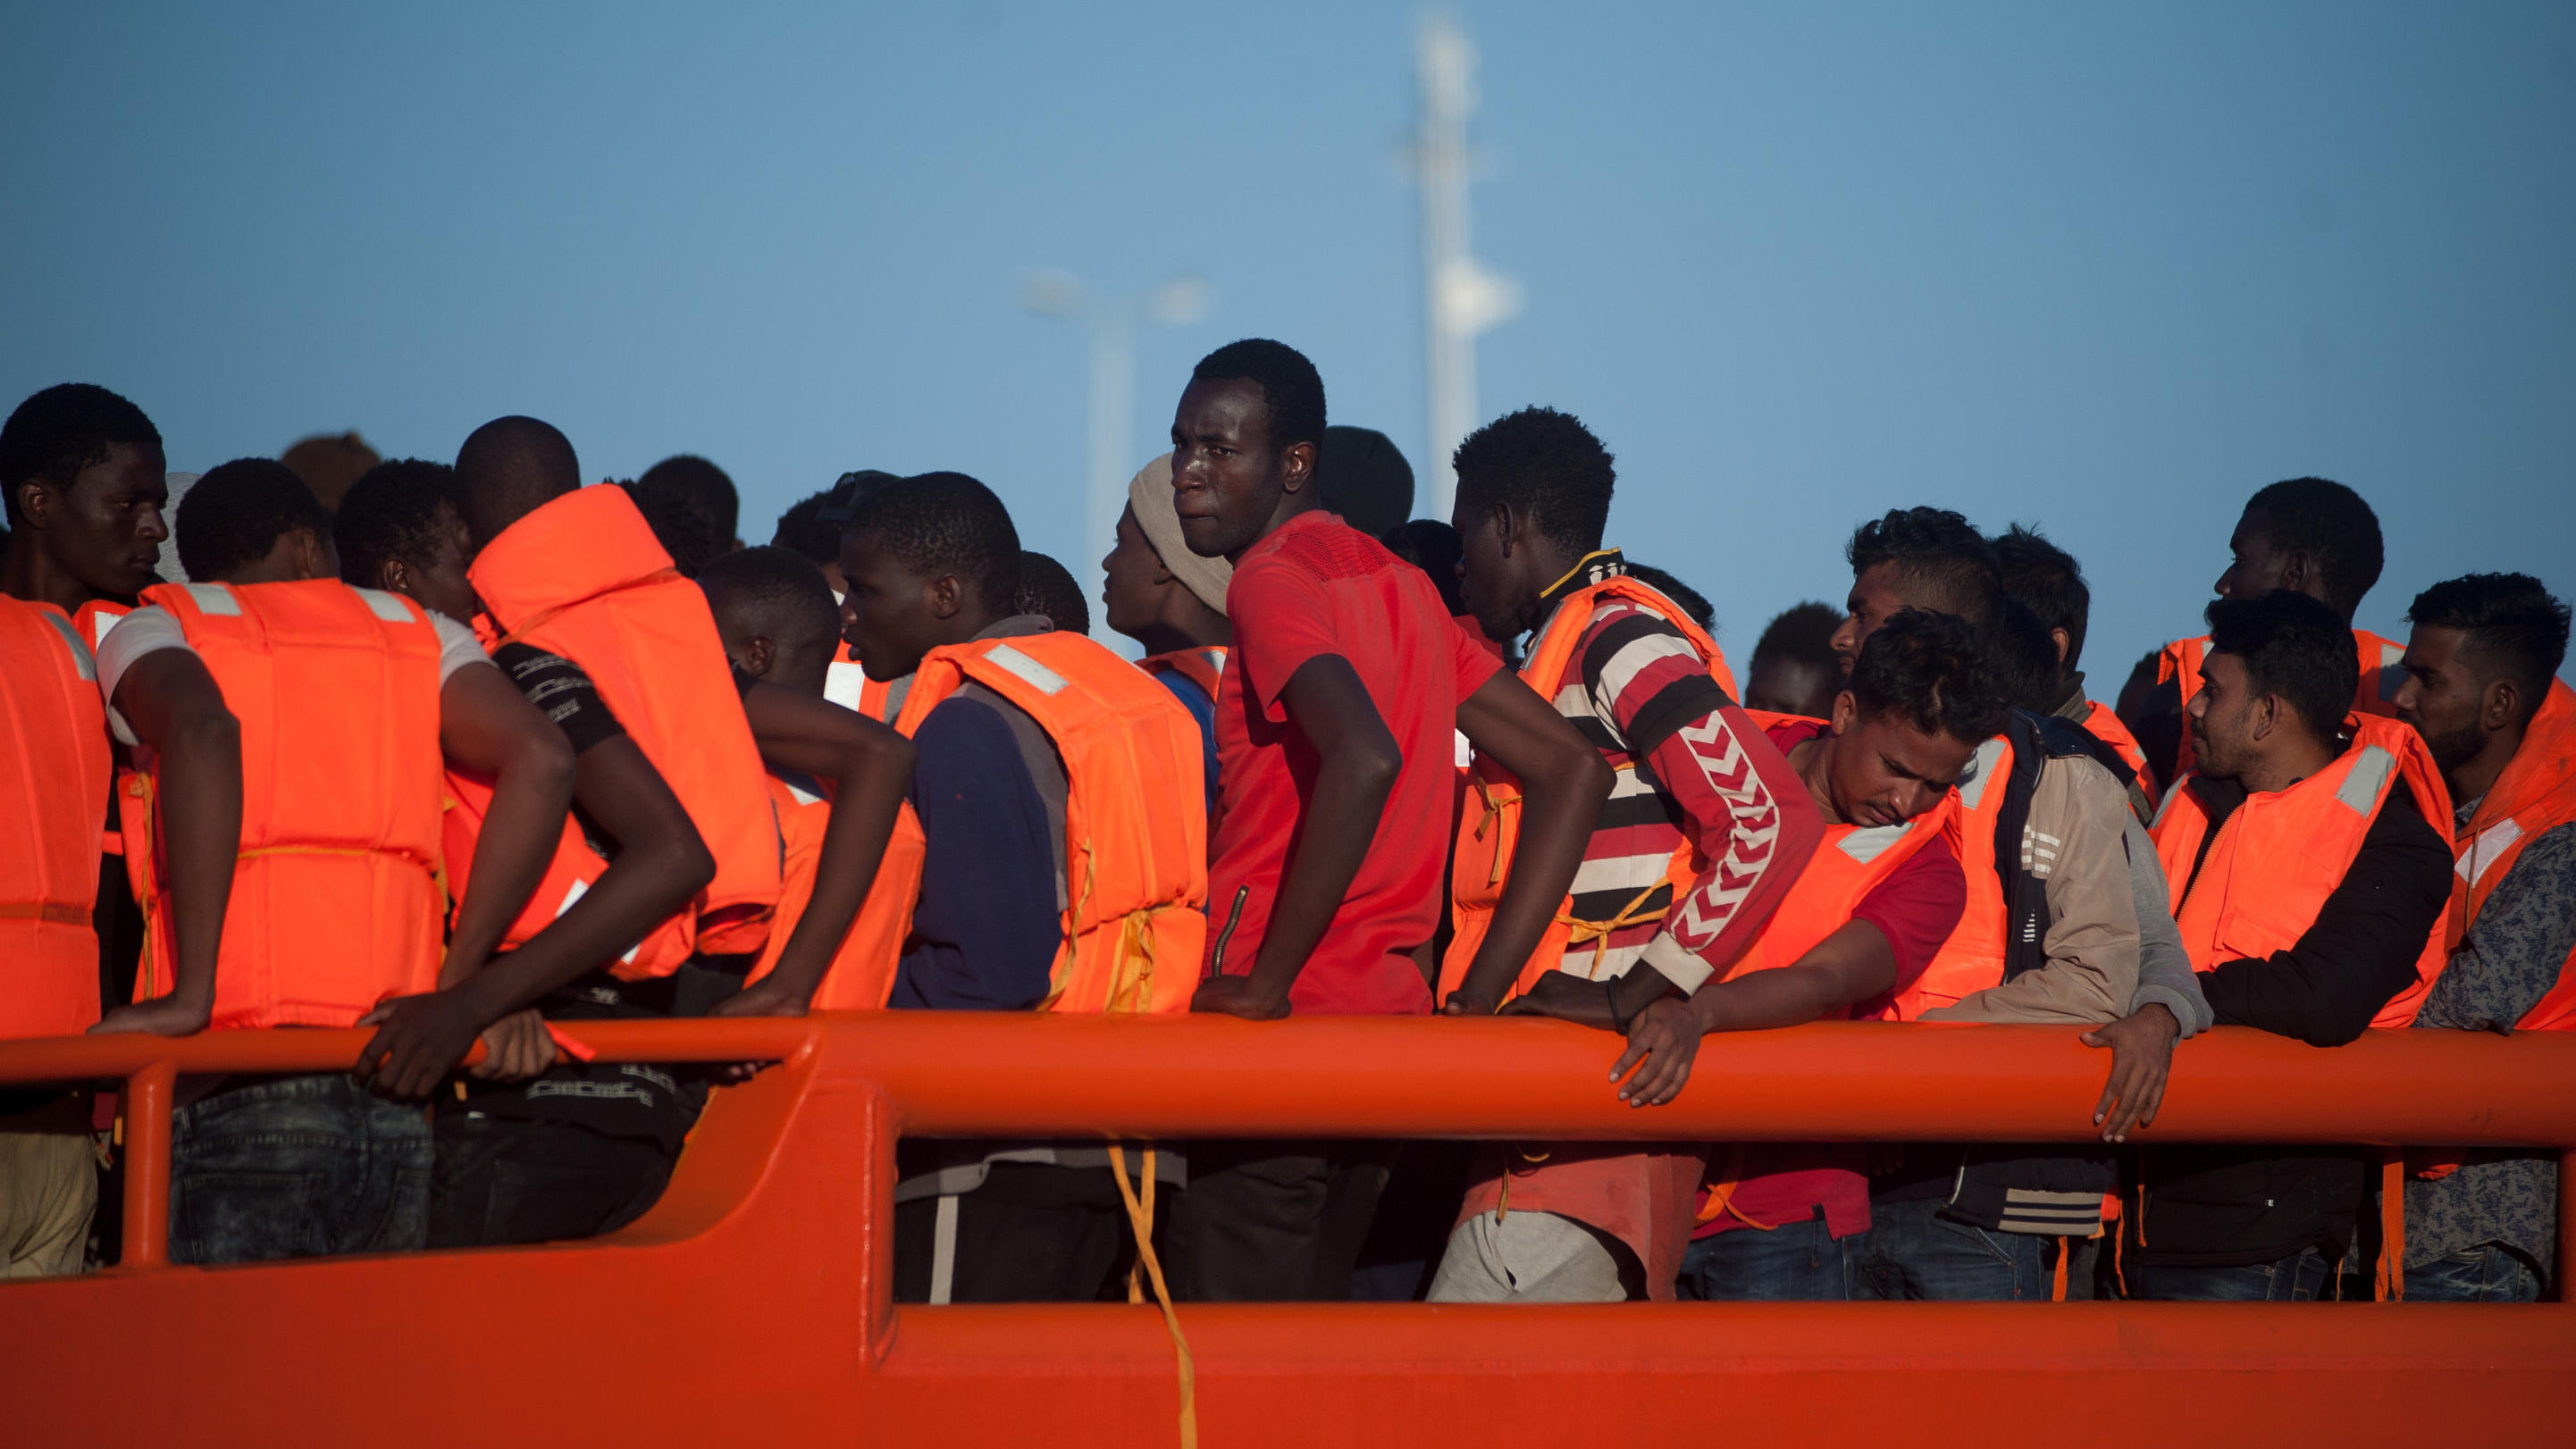 http://aisrtl-a.akamaihd.net/masters/1027419/2883x1622/giuseppe-conte-stellt-sich-quer-italien-nimmt-keine-geretteten-migranten-mehr-auf.jpg